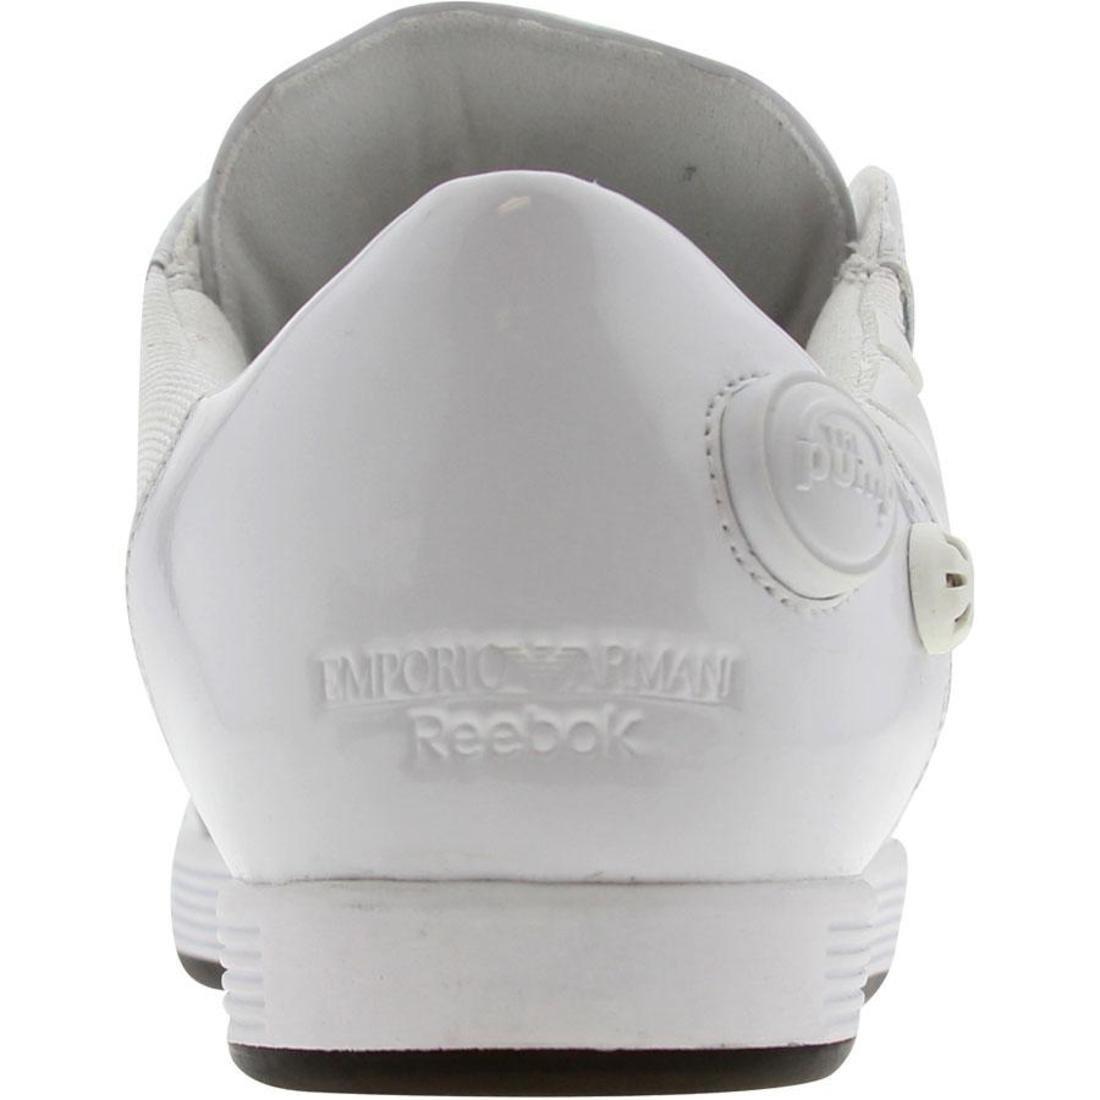 Punto esclamativo dai unocchiata editore  Reebok x Emporio Armani The Pump Vintage Low — Armani Shoes